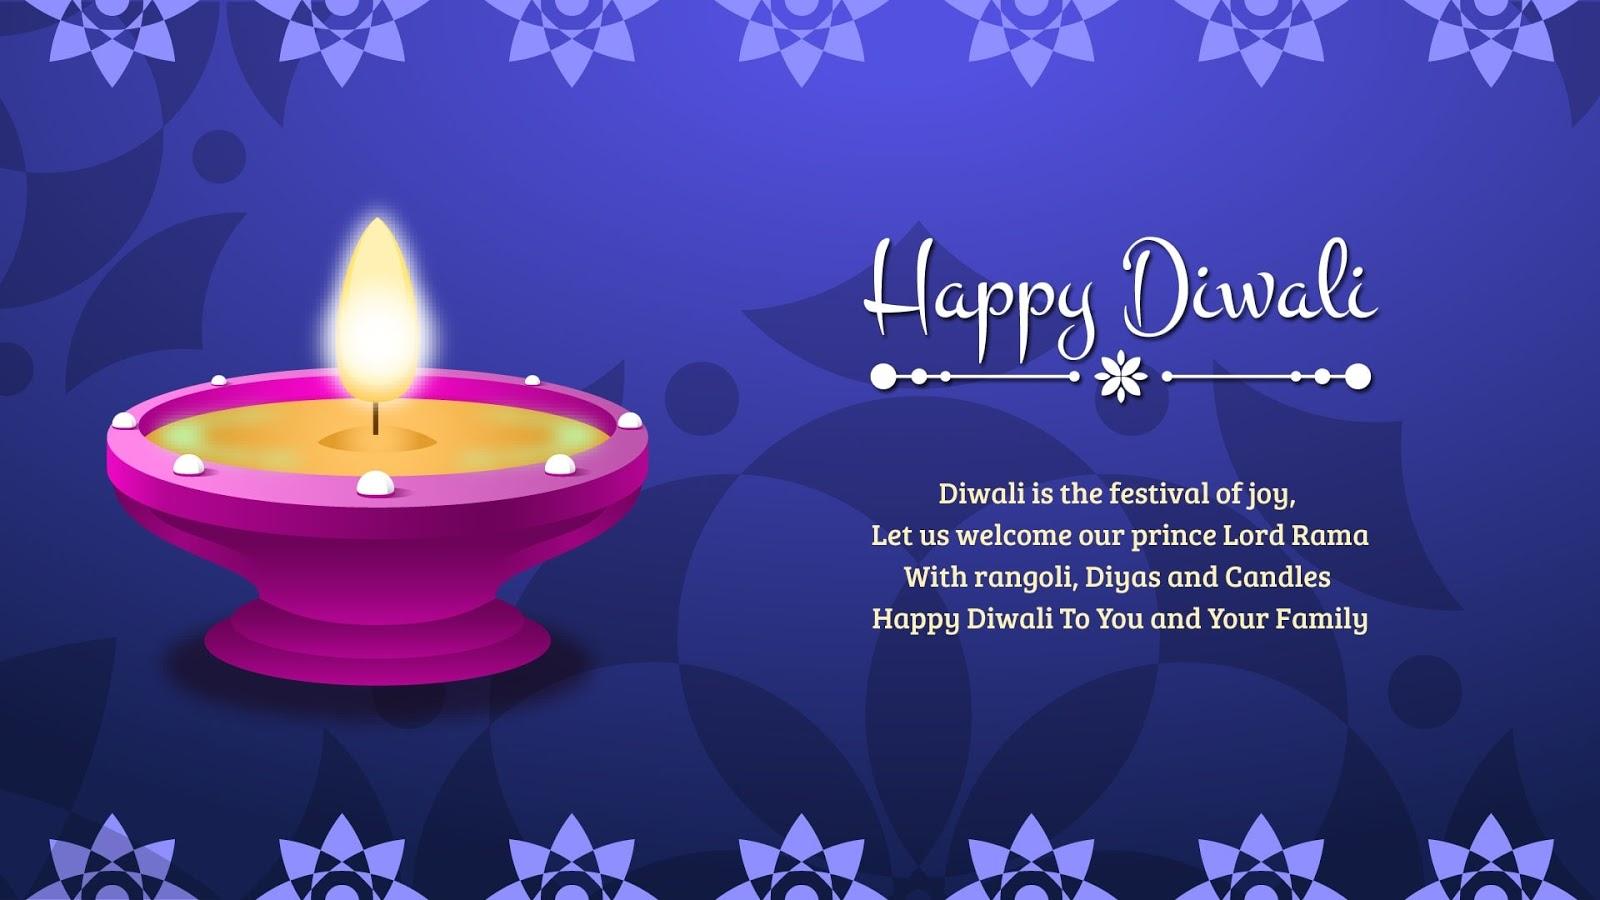 Free Ecards Diwali Greetings Birthday Cards Wallpapers